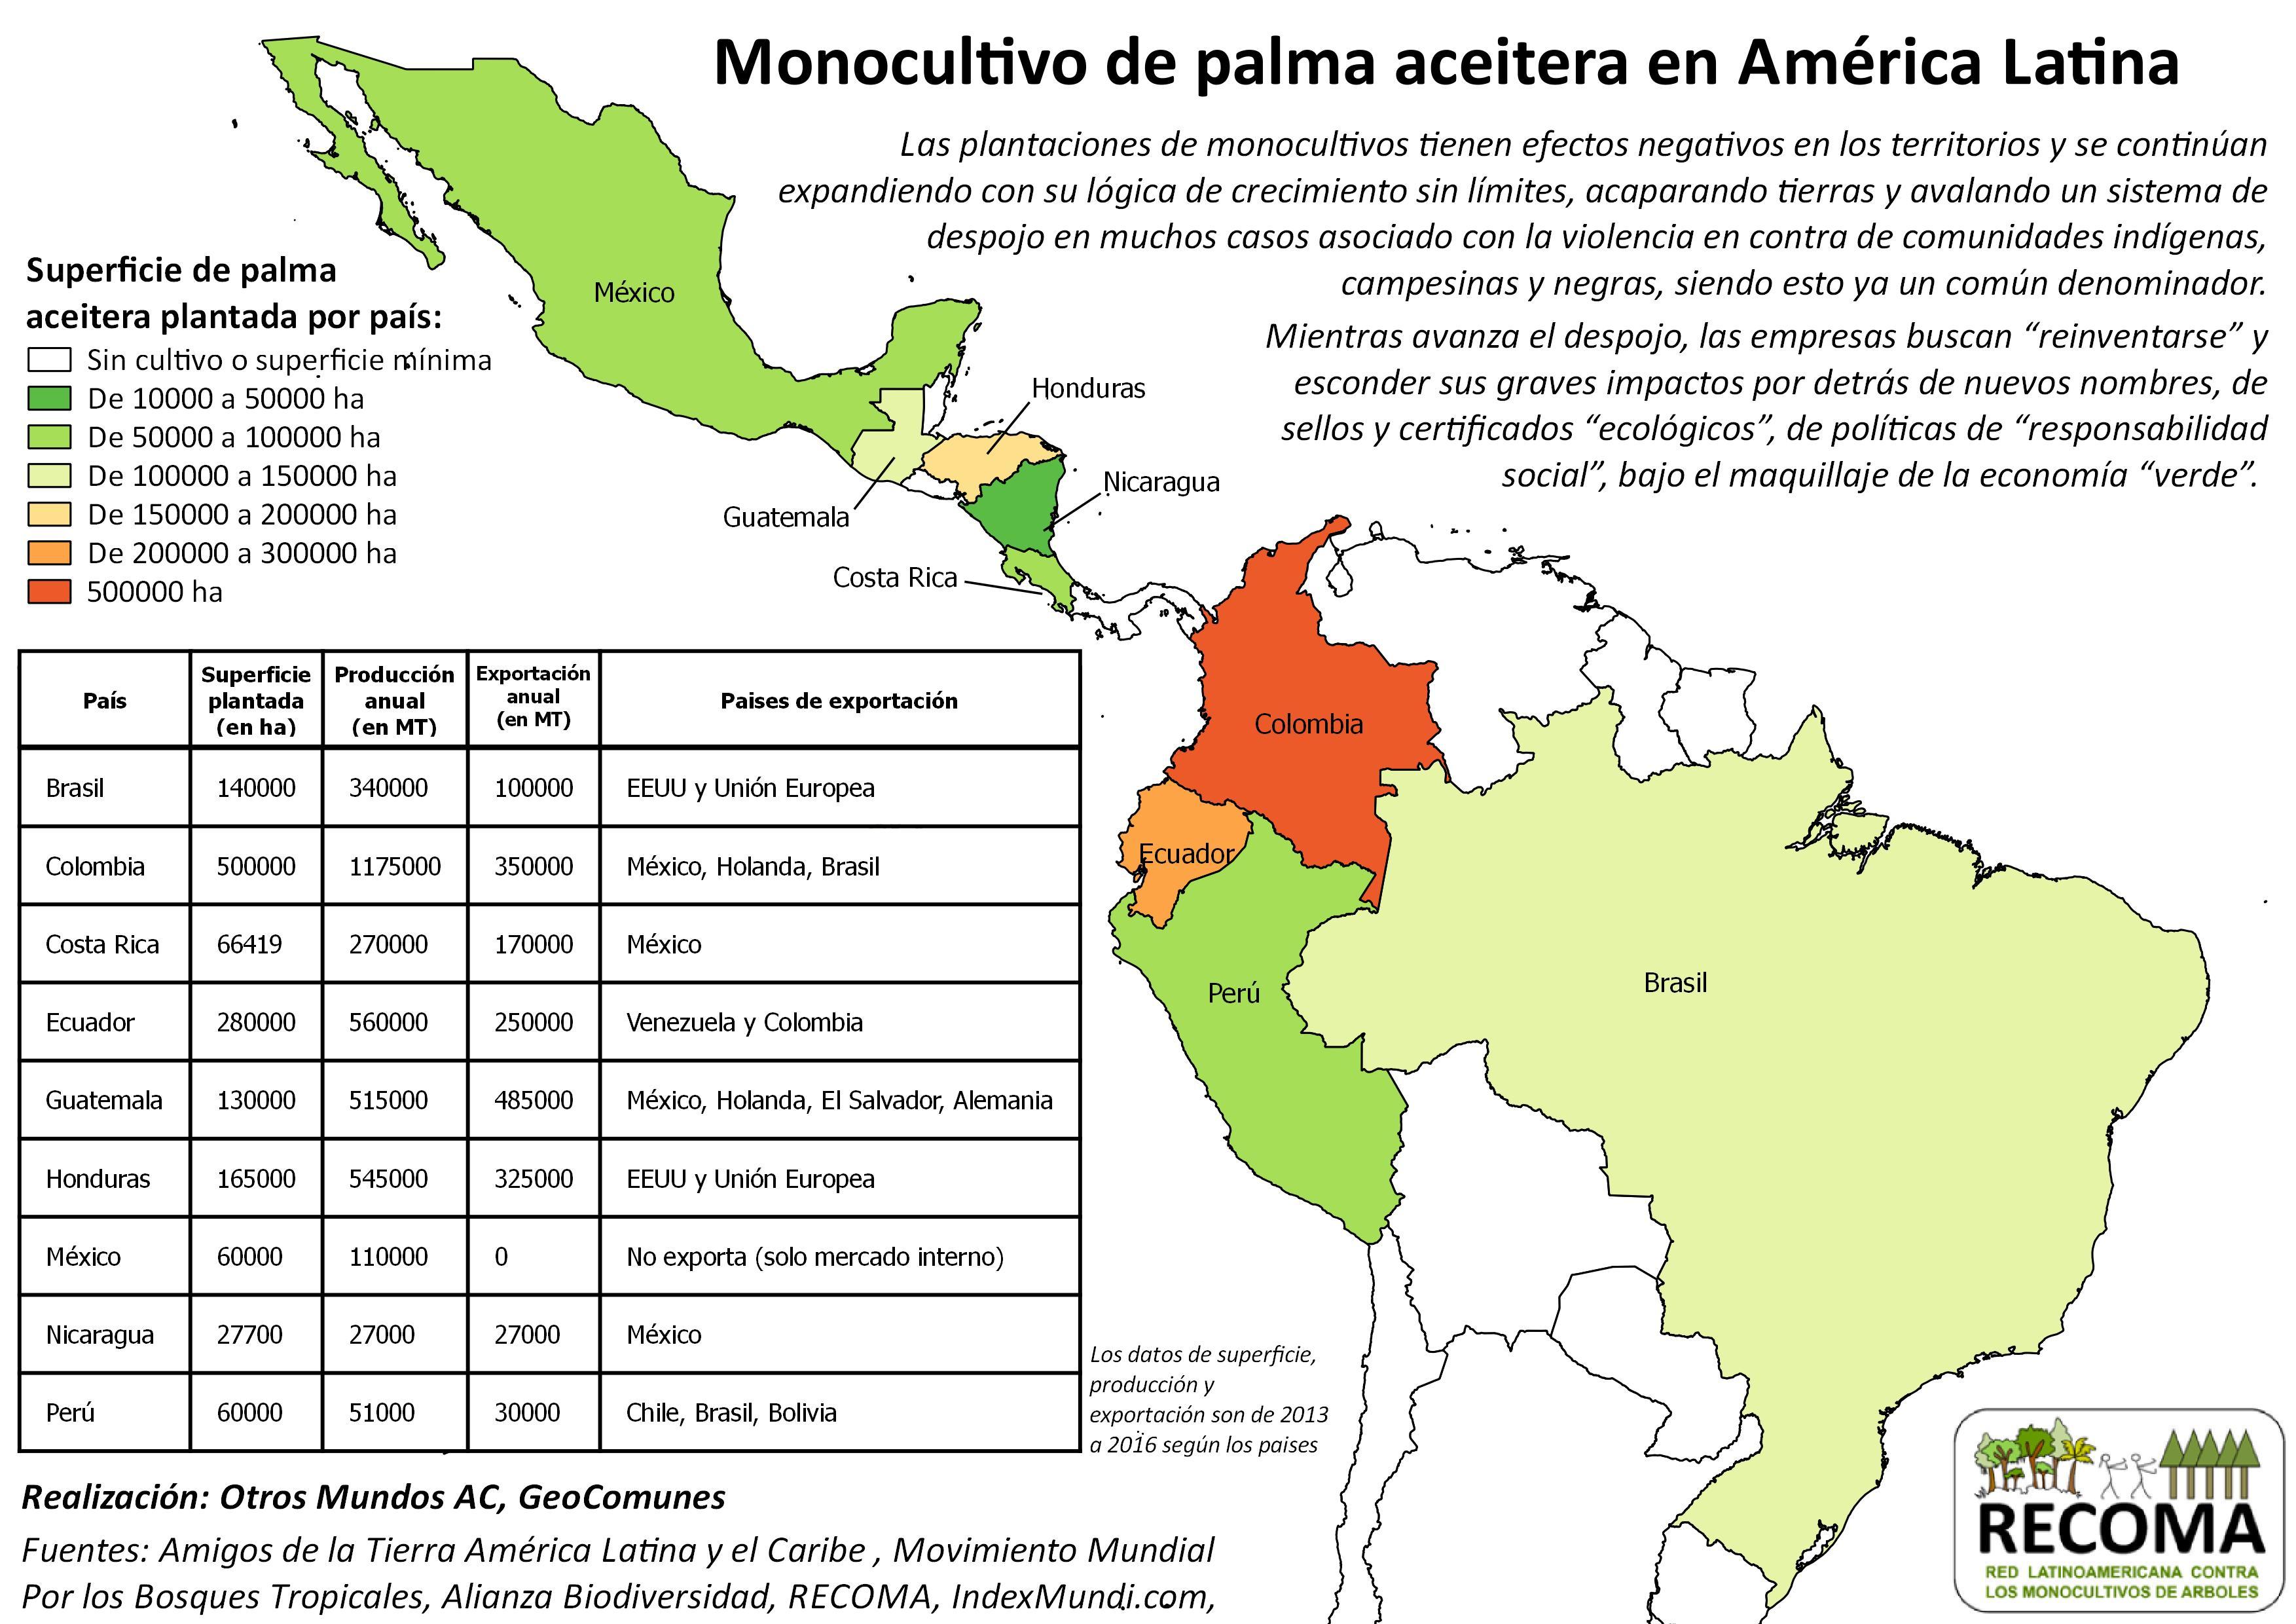 Mapa Palma Aceite ra AmLat